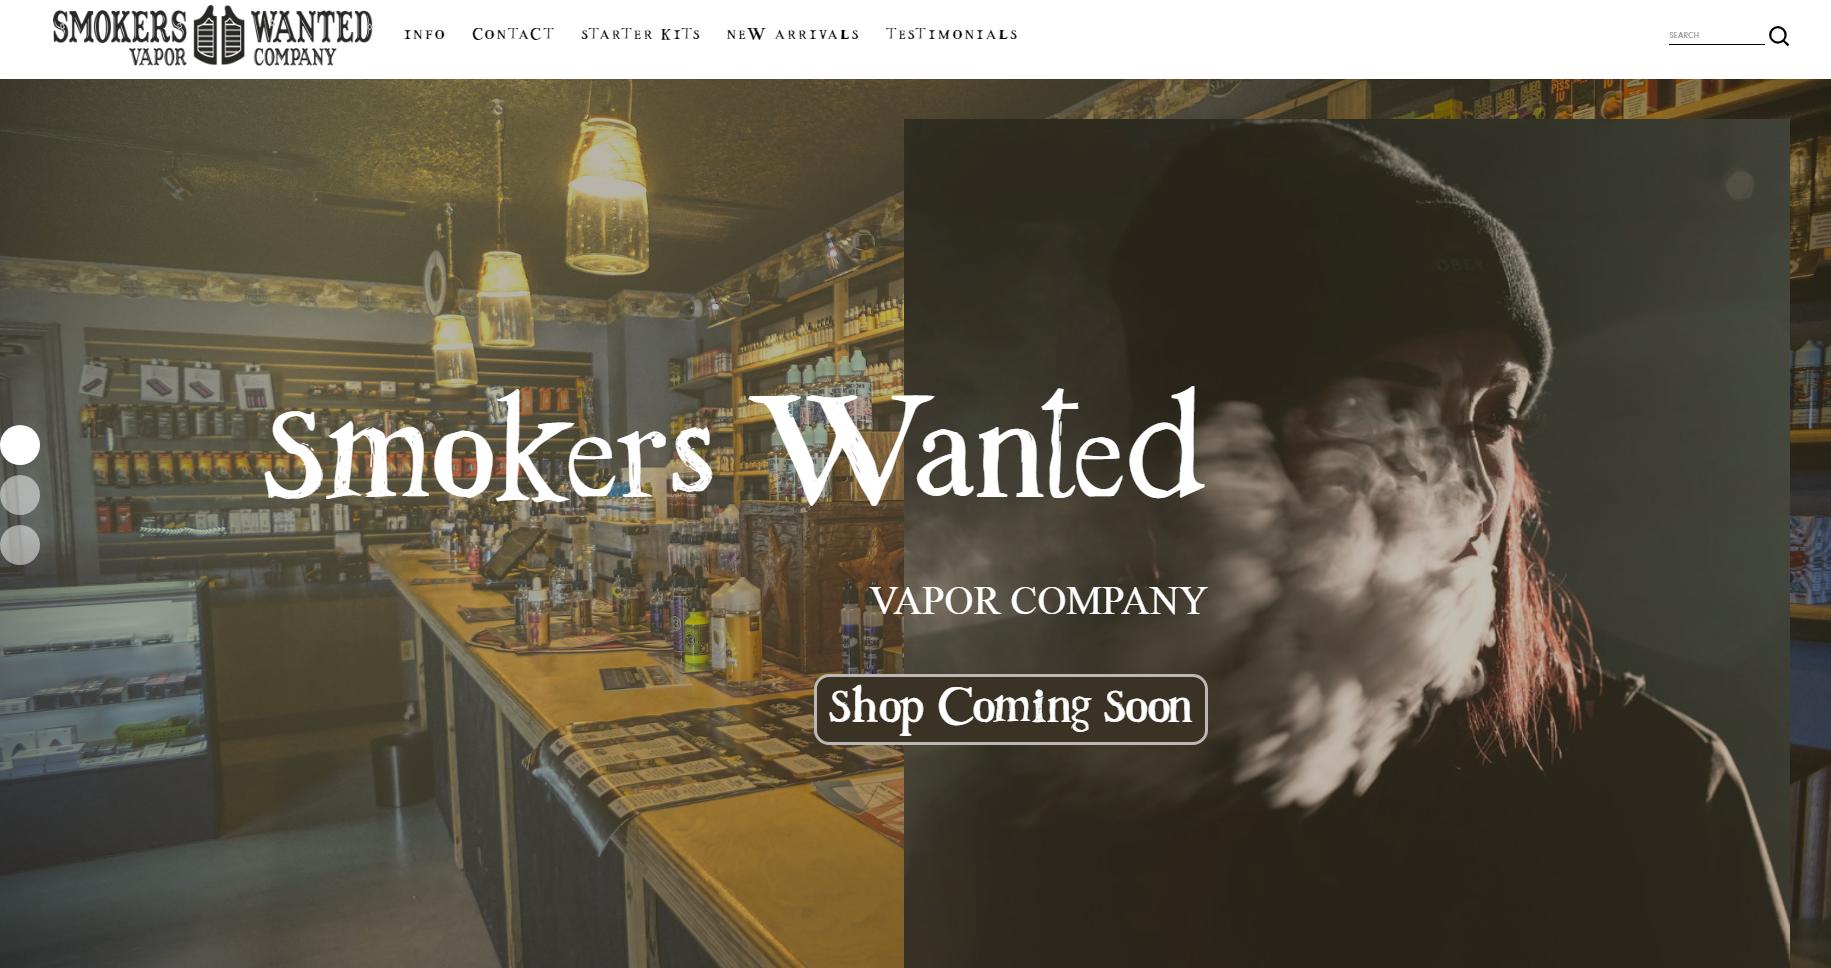 Smokers Wanted - Vapor Company